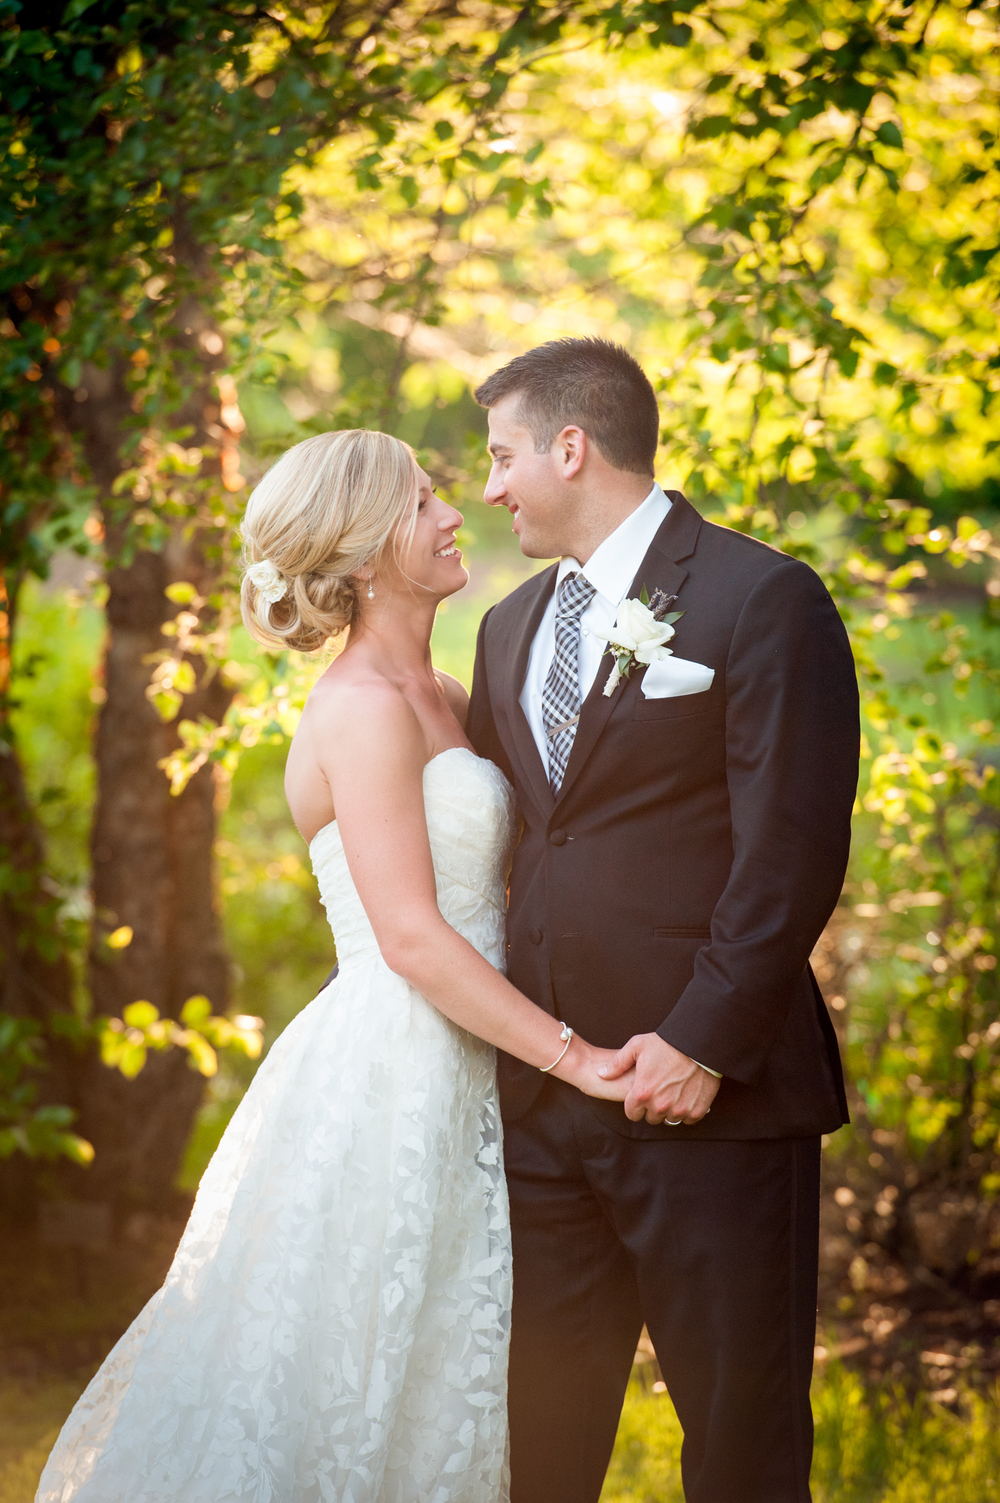 Rochester Wedding Photography 002.jpg